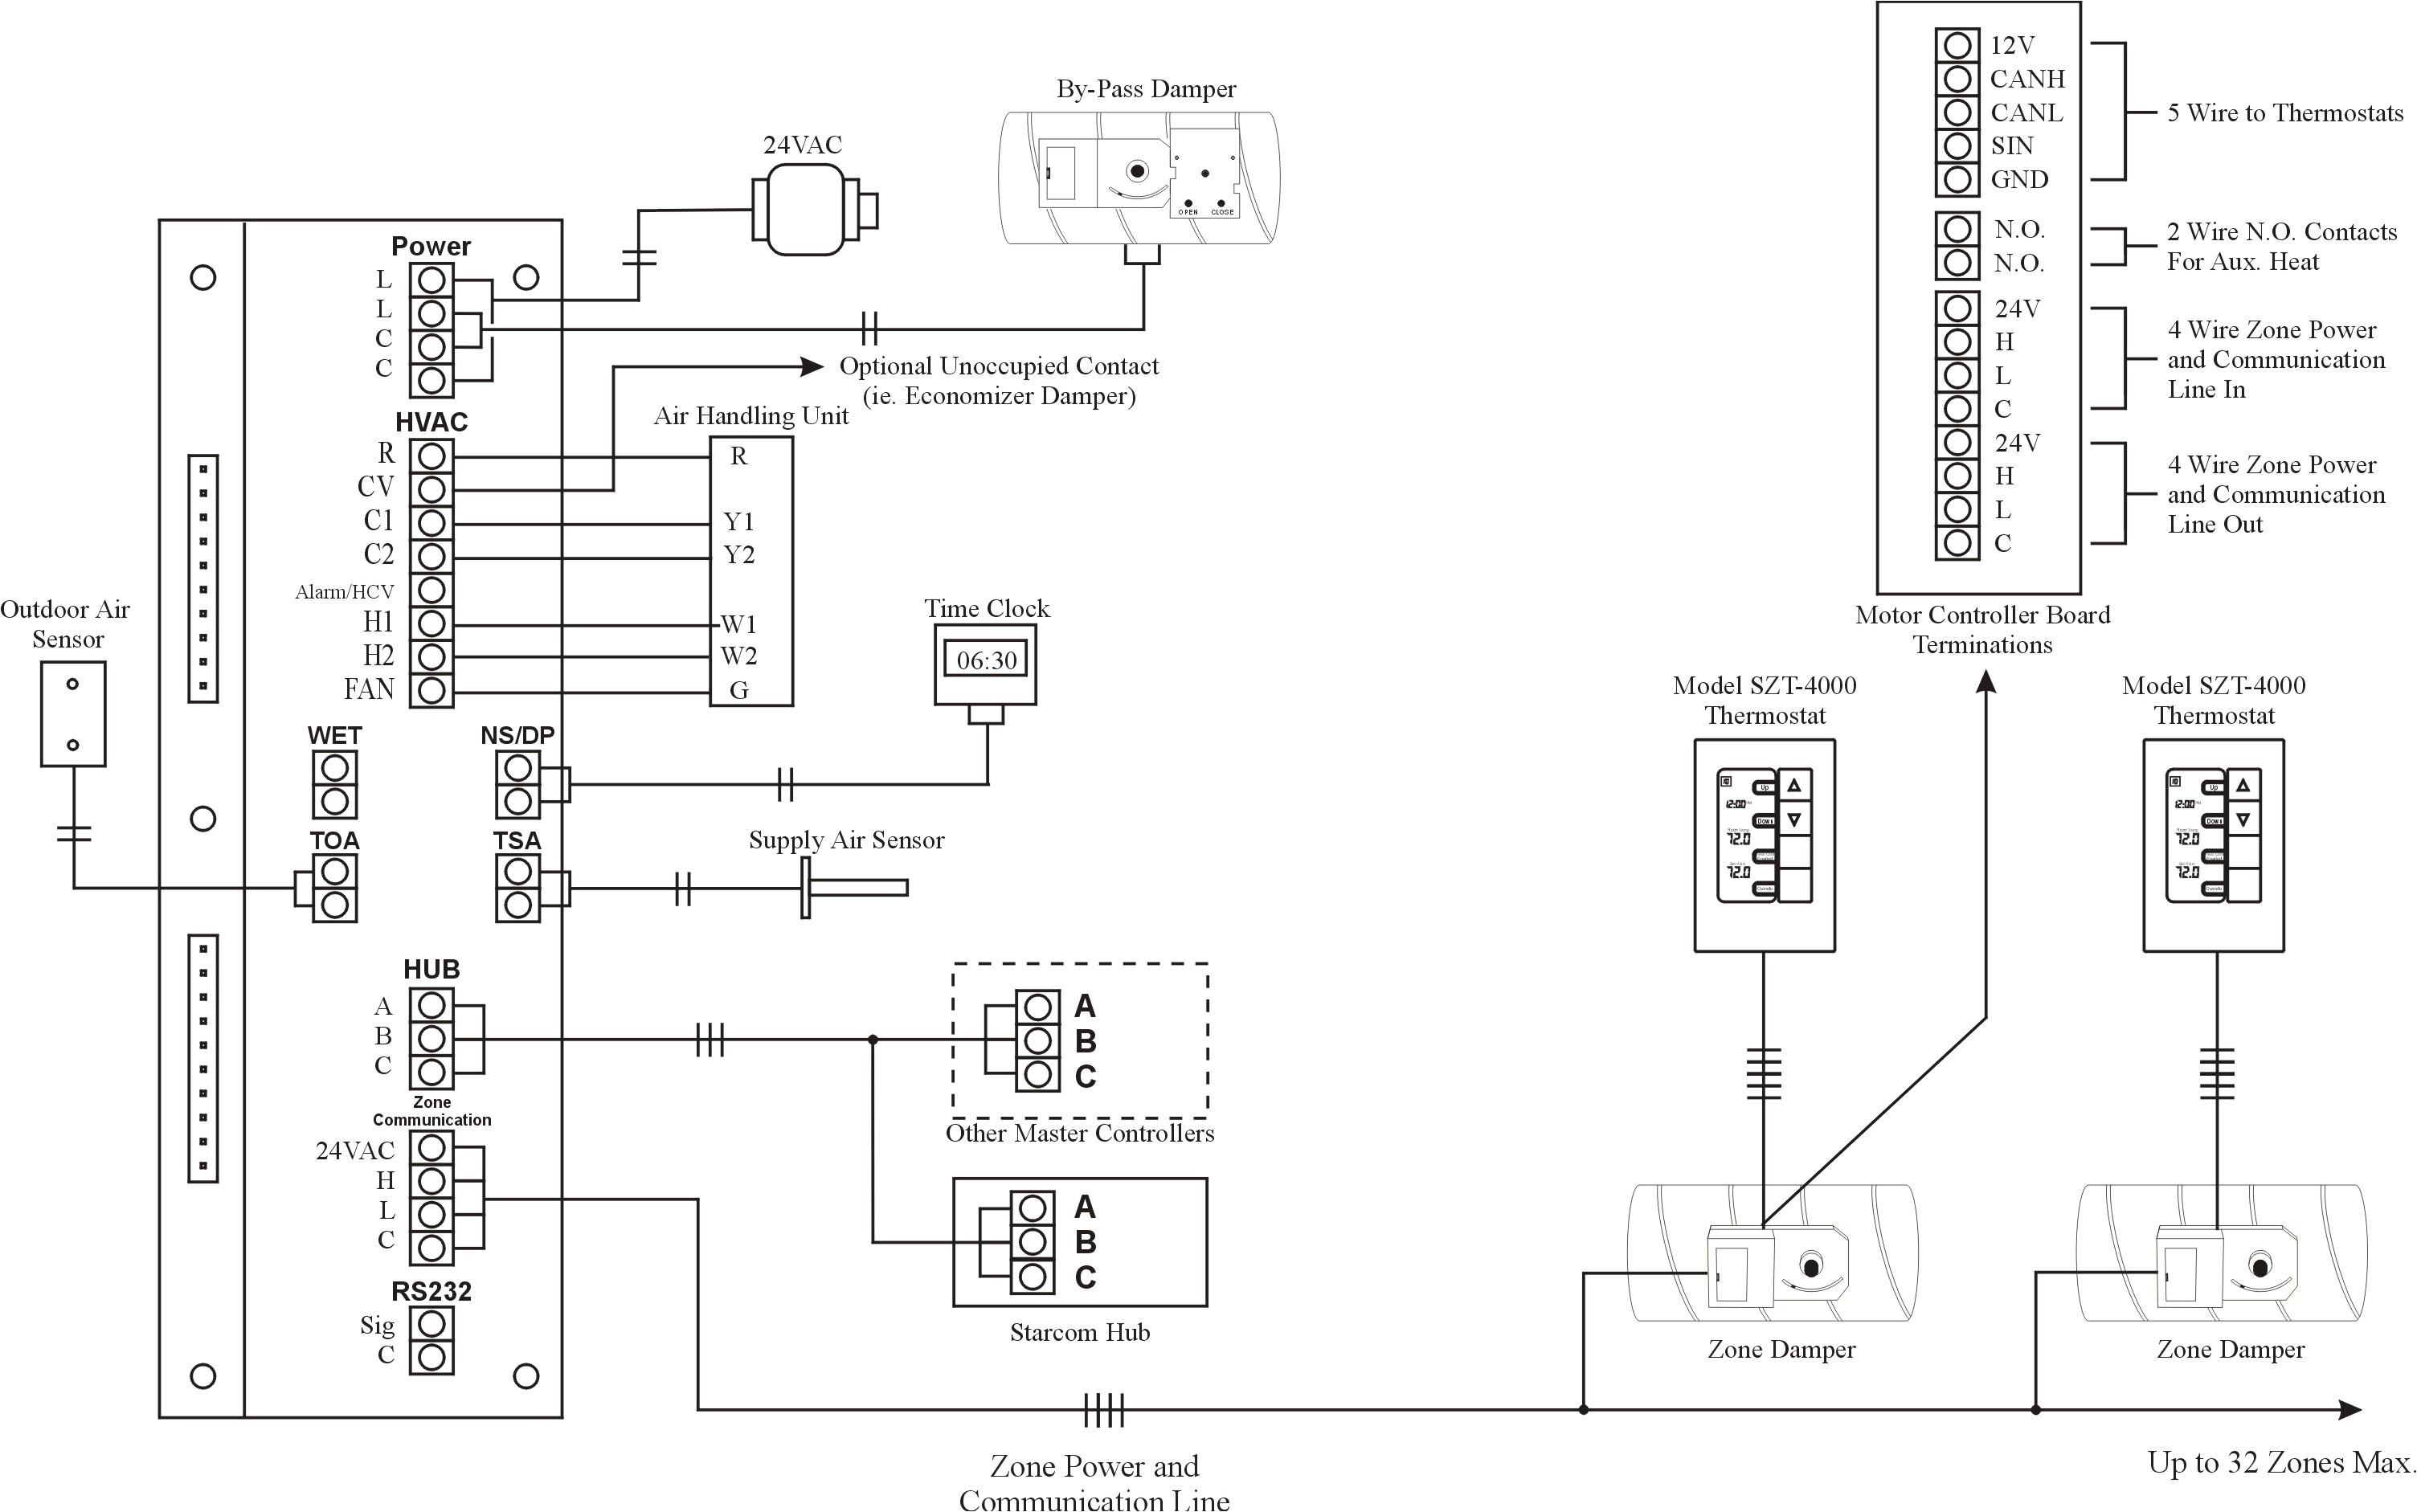 adt wiring diagram wire diagram database adt focus 200 wiring diagram adt focus 200 wiring diagram